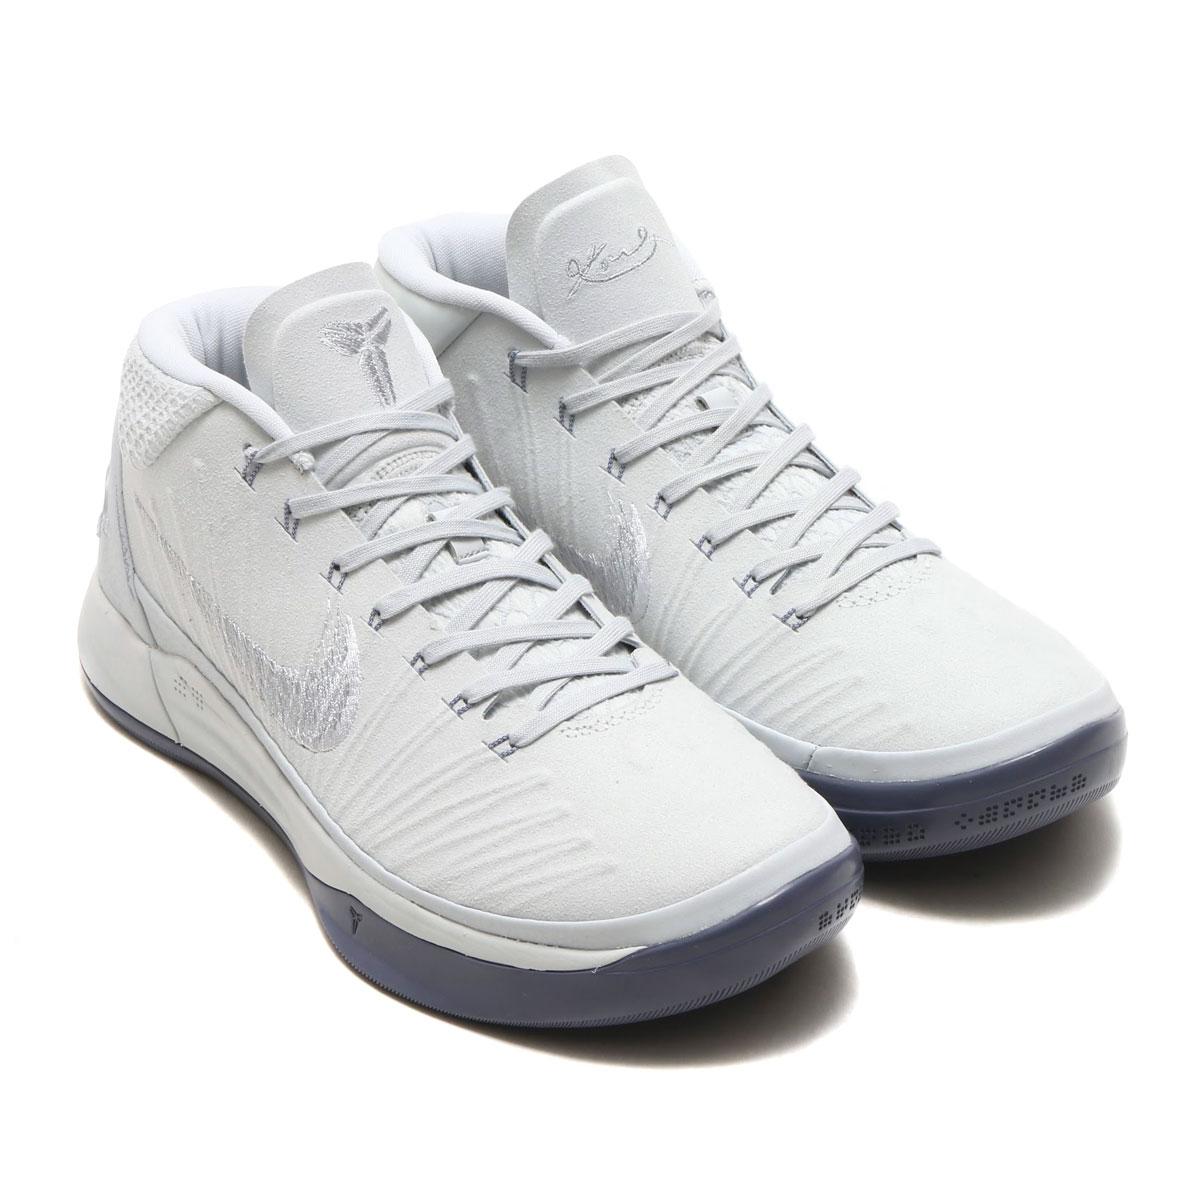 f003cccf34b6 NIKE KOBE AD EP (Nike Corby AD EP) (PURE PLATINUM WHITE-METALLIC SILVER)  18SP-S